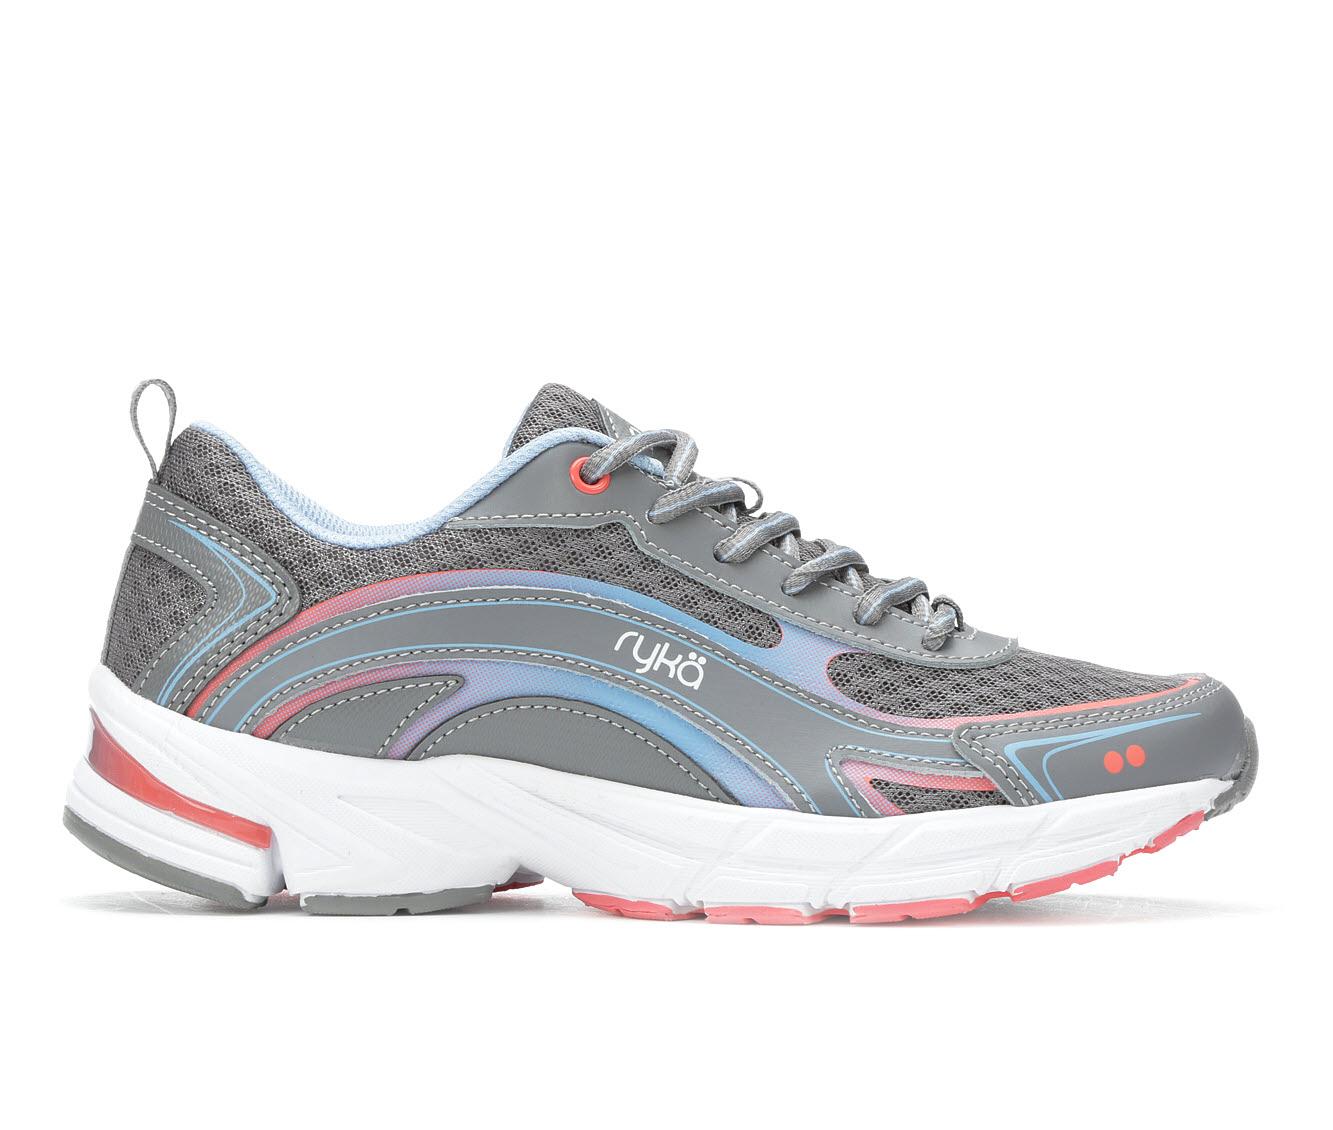 Ryka Inspire Women's Athletic Shoe (Gray)